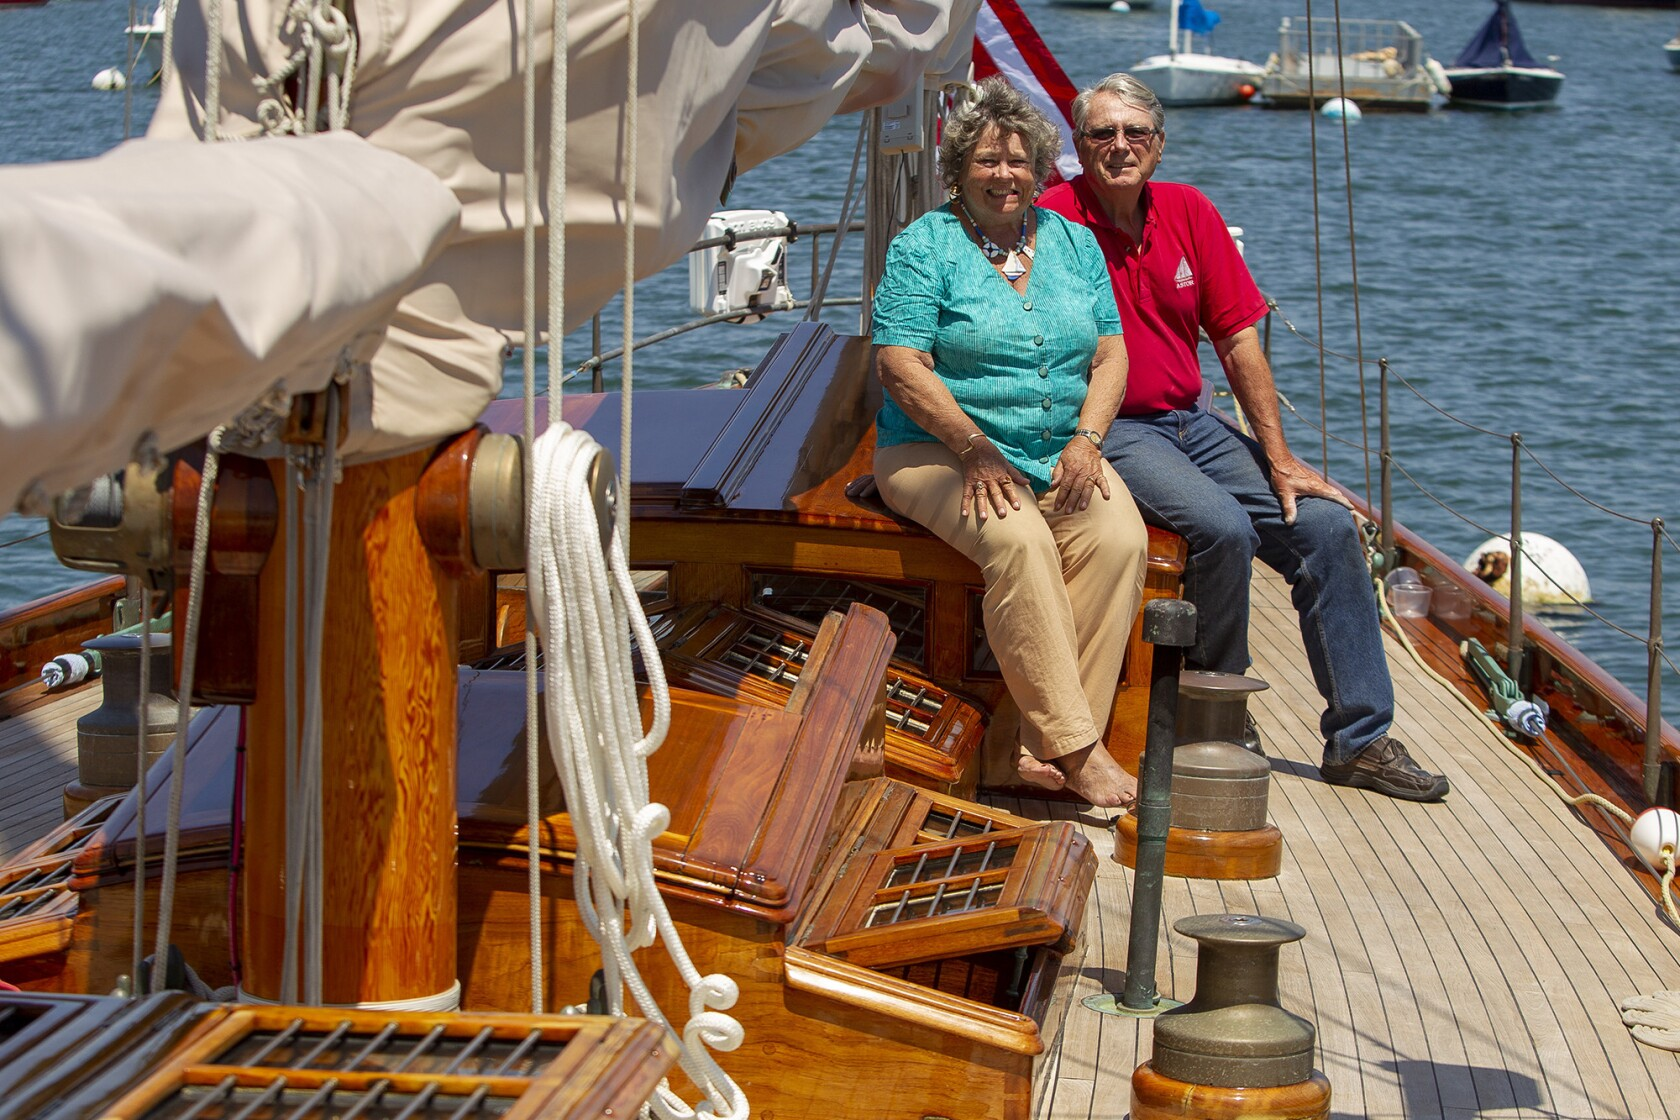 Teak performance: Newport Beach Wooden Boat Festival cruises ...